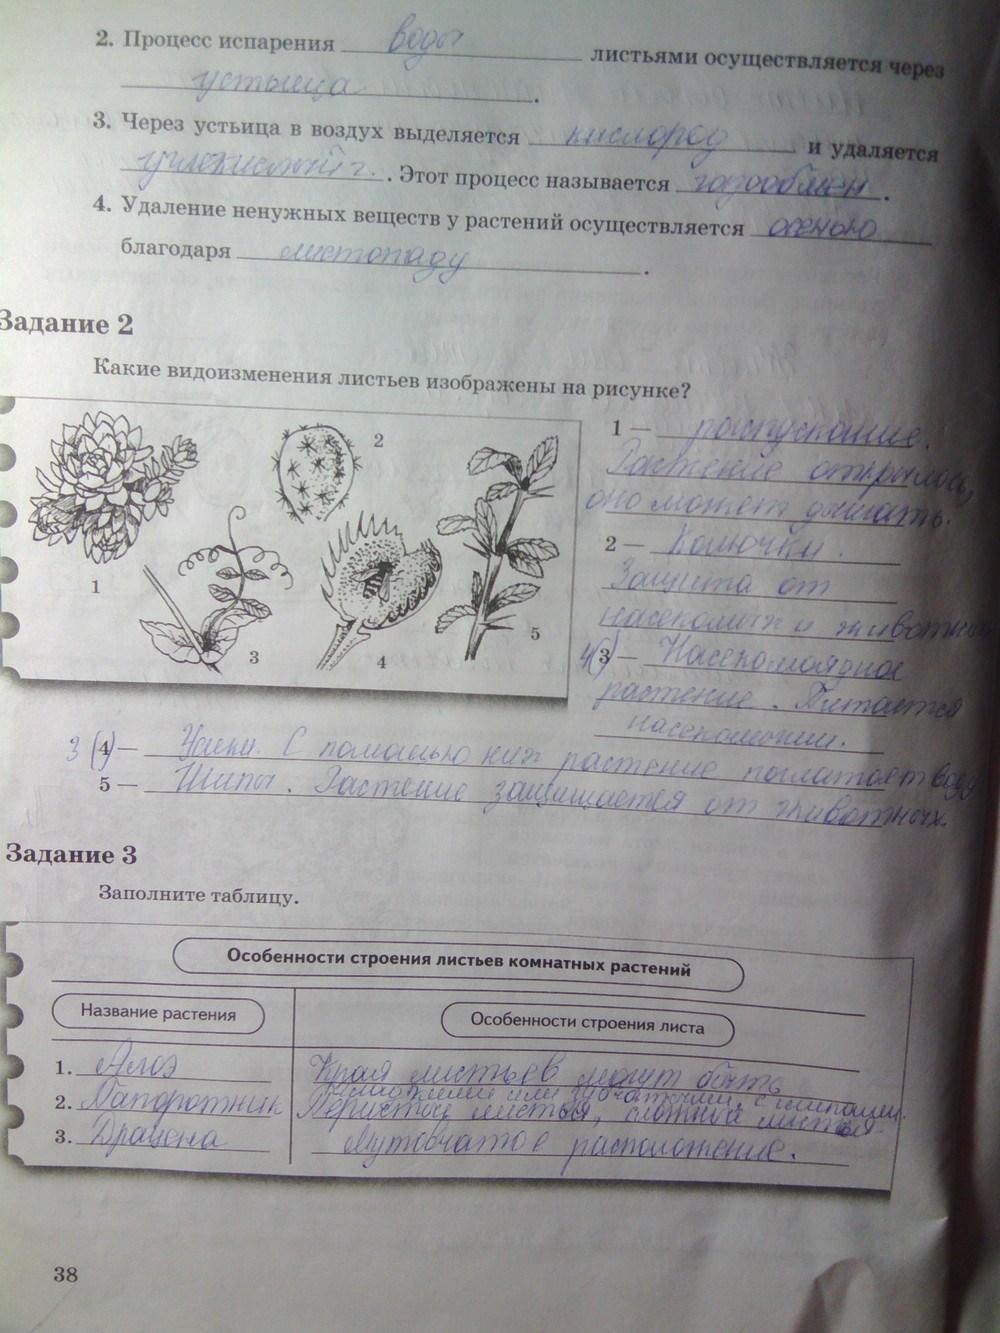 биологию 6 кучменко пономарева гдз корнилова класс на